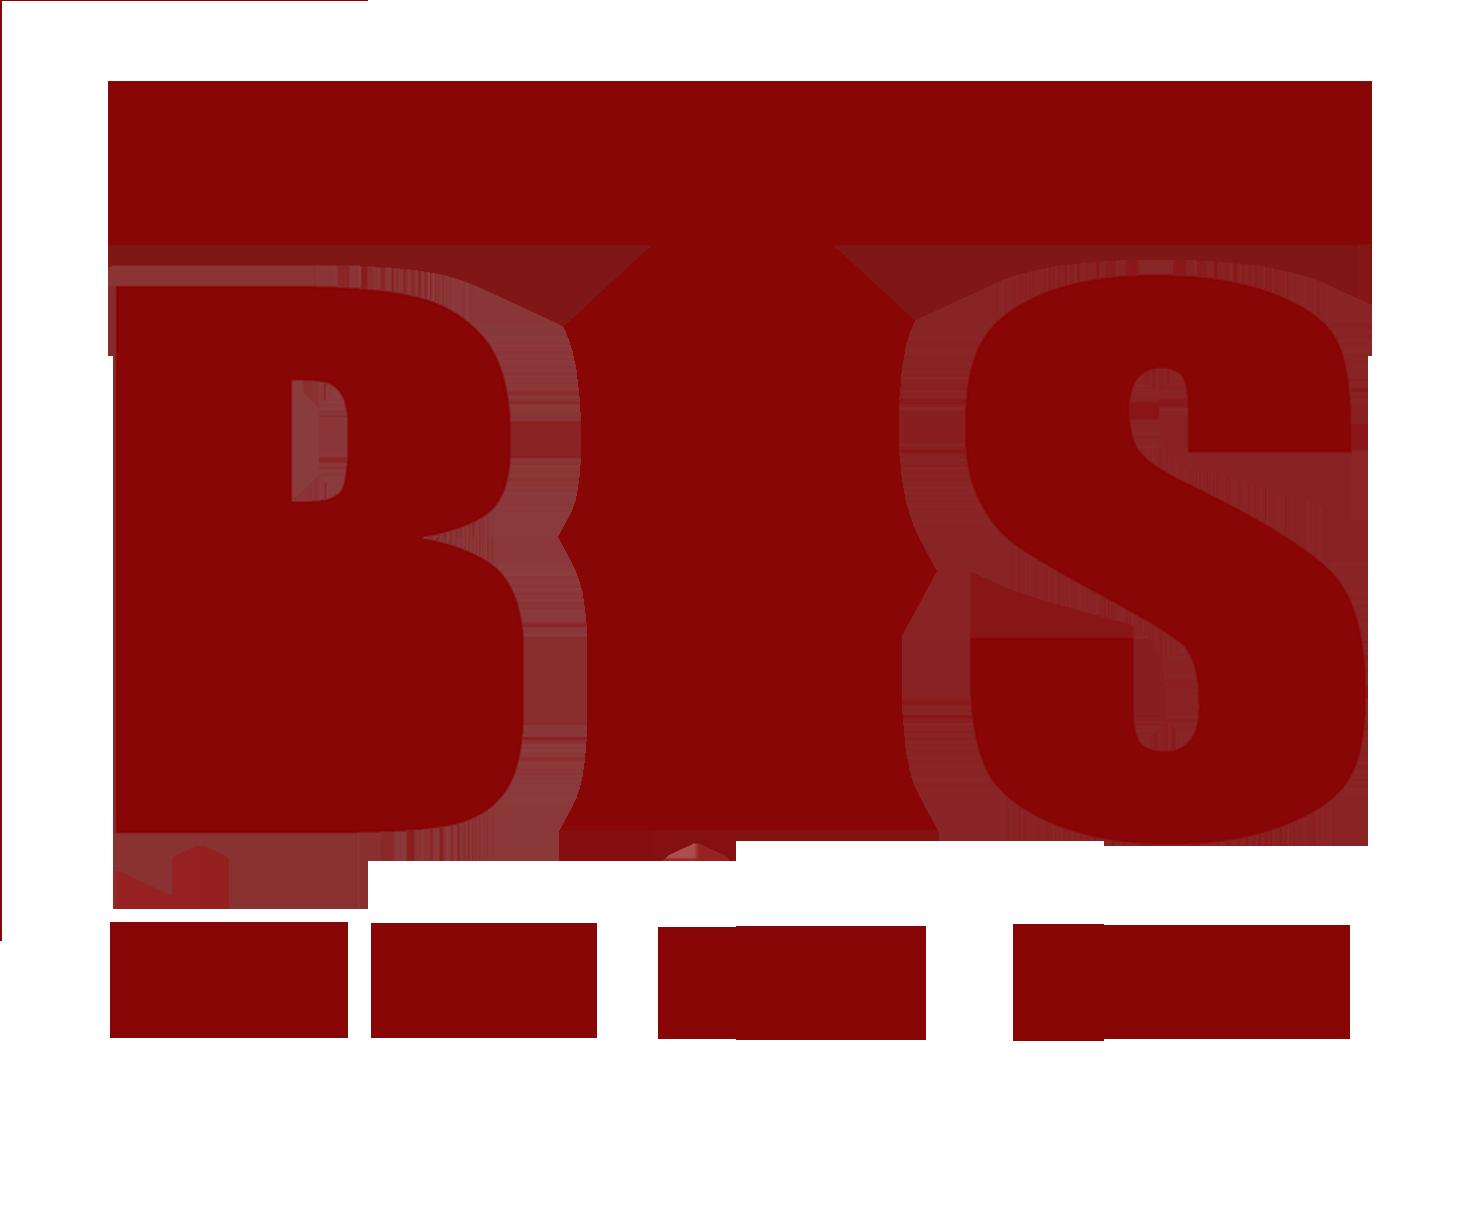 Behind The Seen logo